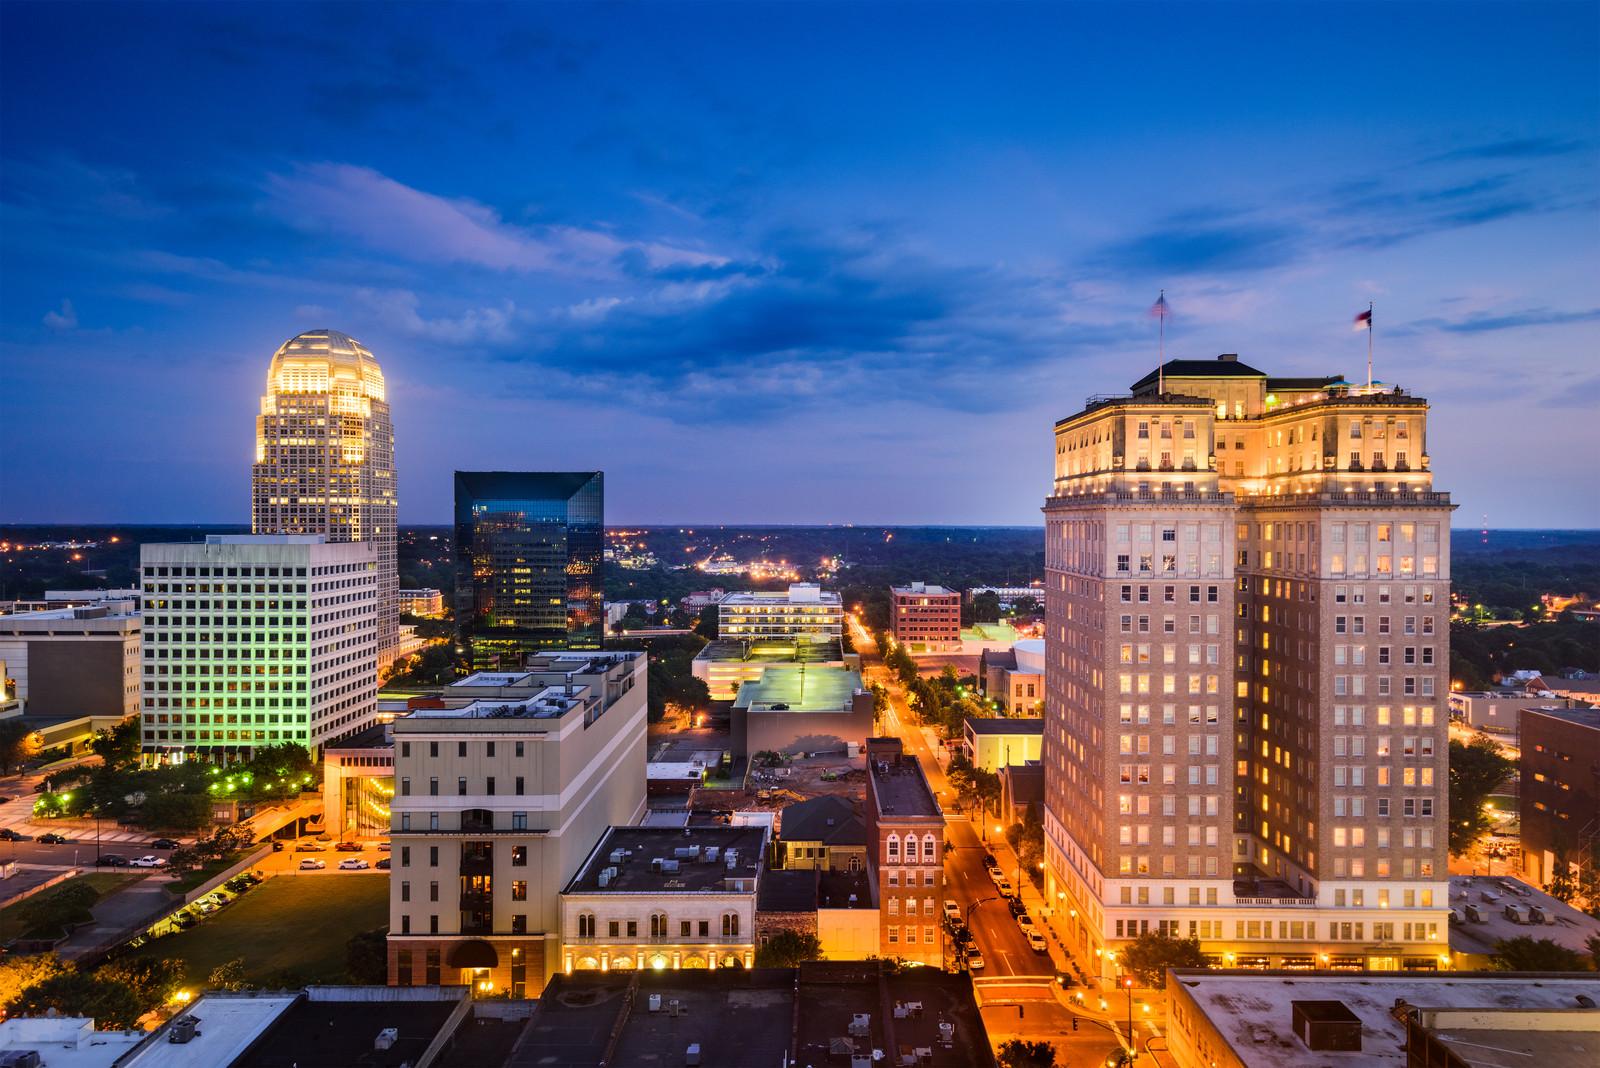 Winston-Salem, North Carolina, evening skyline with blue purple skies and lighted up buildings